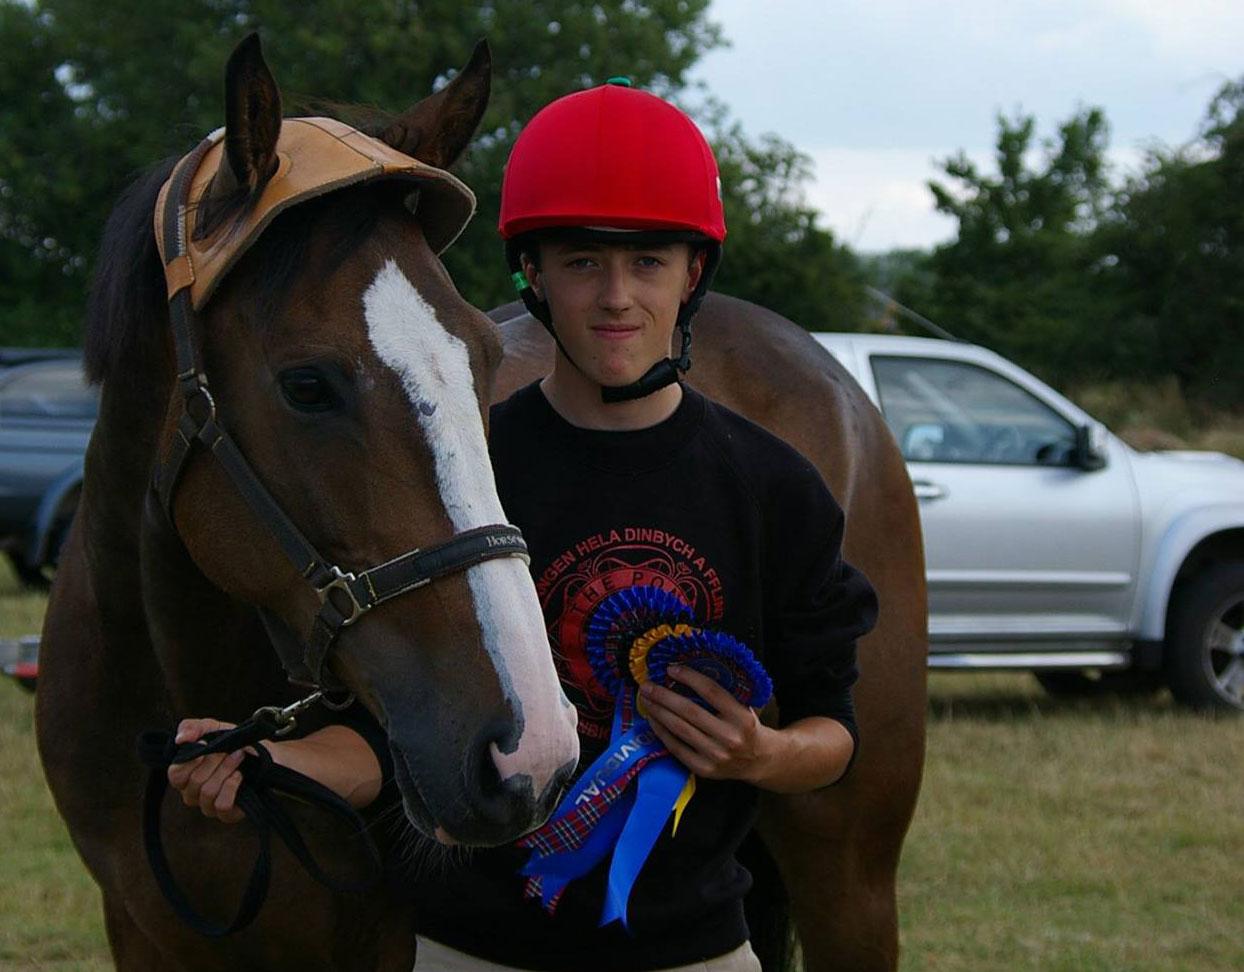 Ben reaches Tetrathlon Championships